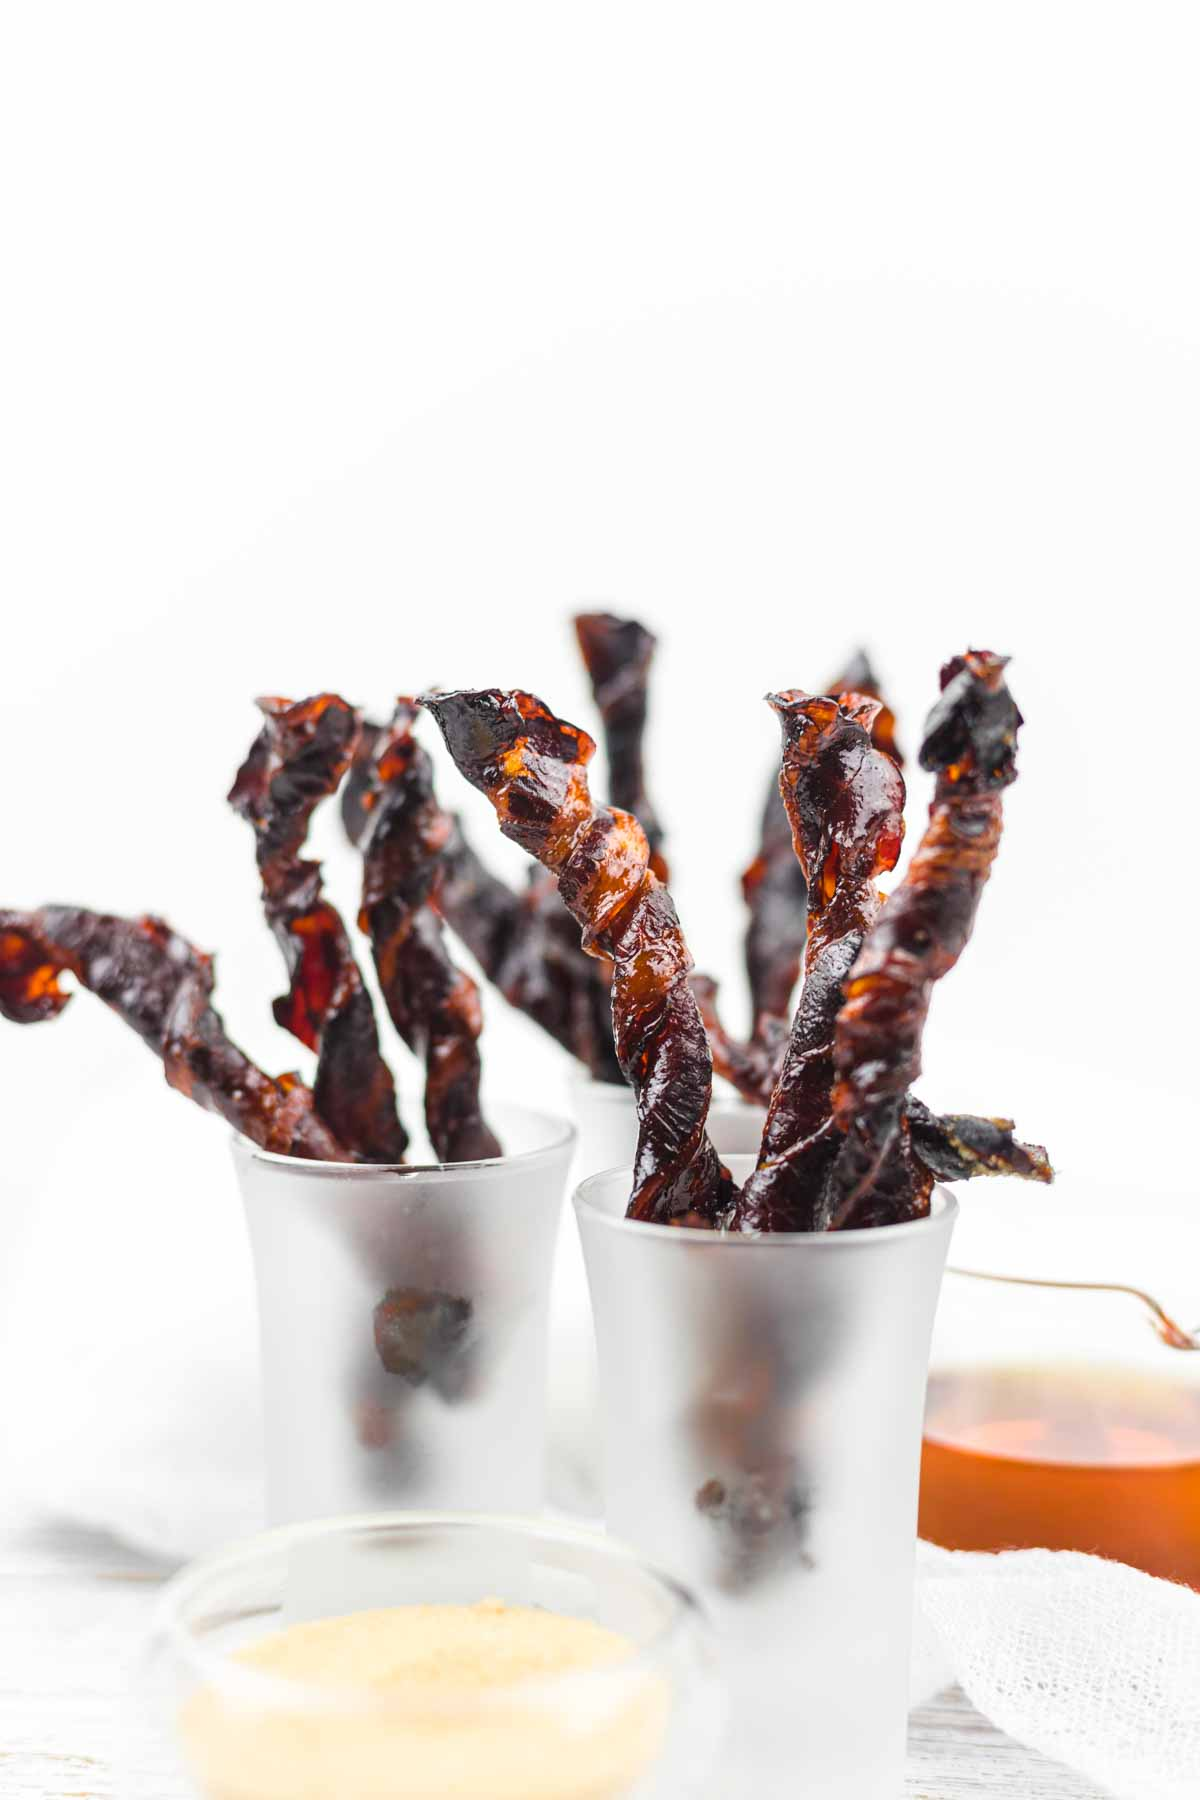 Brown Sugar Keto Bacon Twists as a Halloween snack